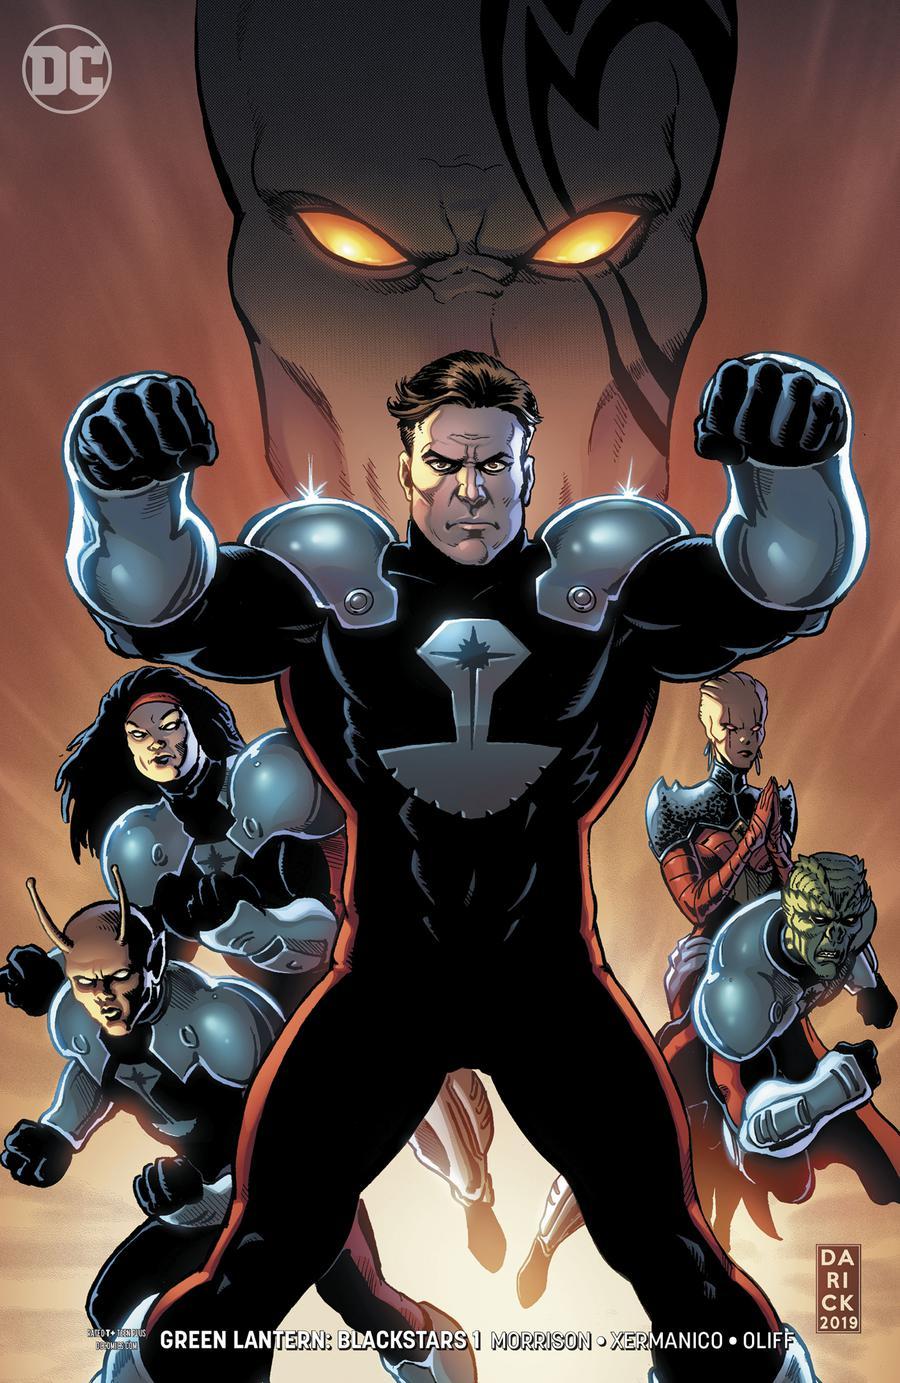 Green Lantern: Blackstars Vol 1 1